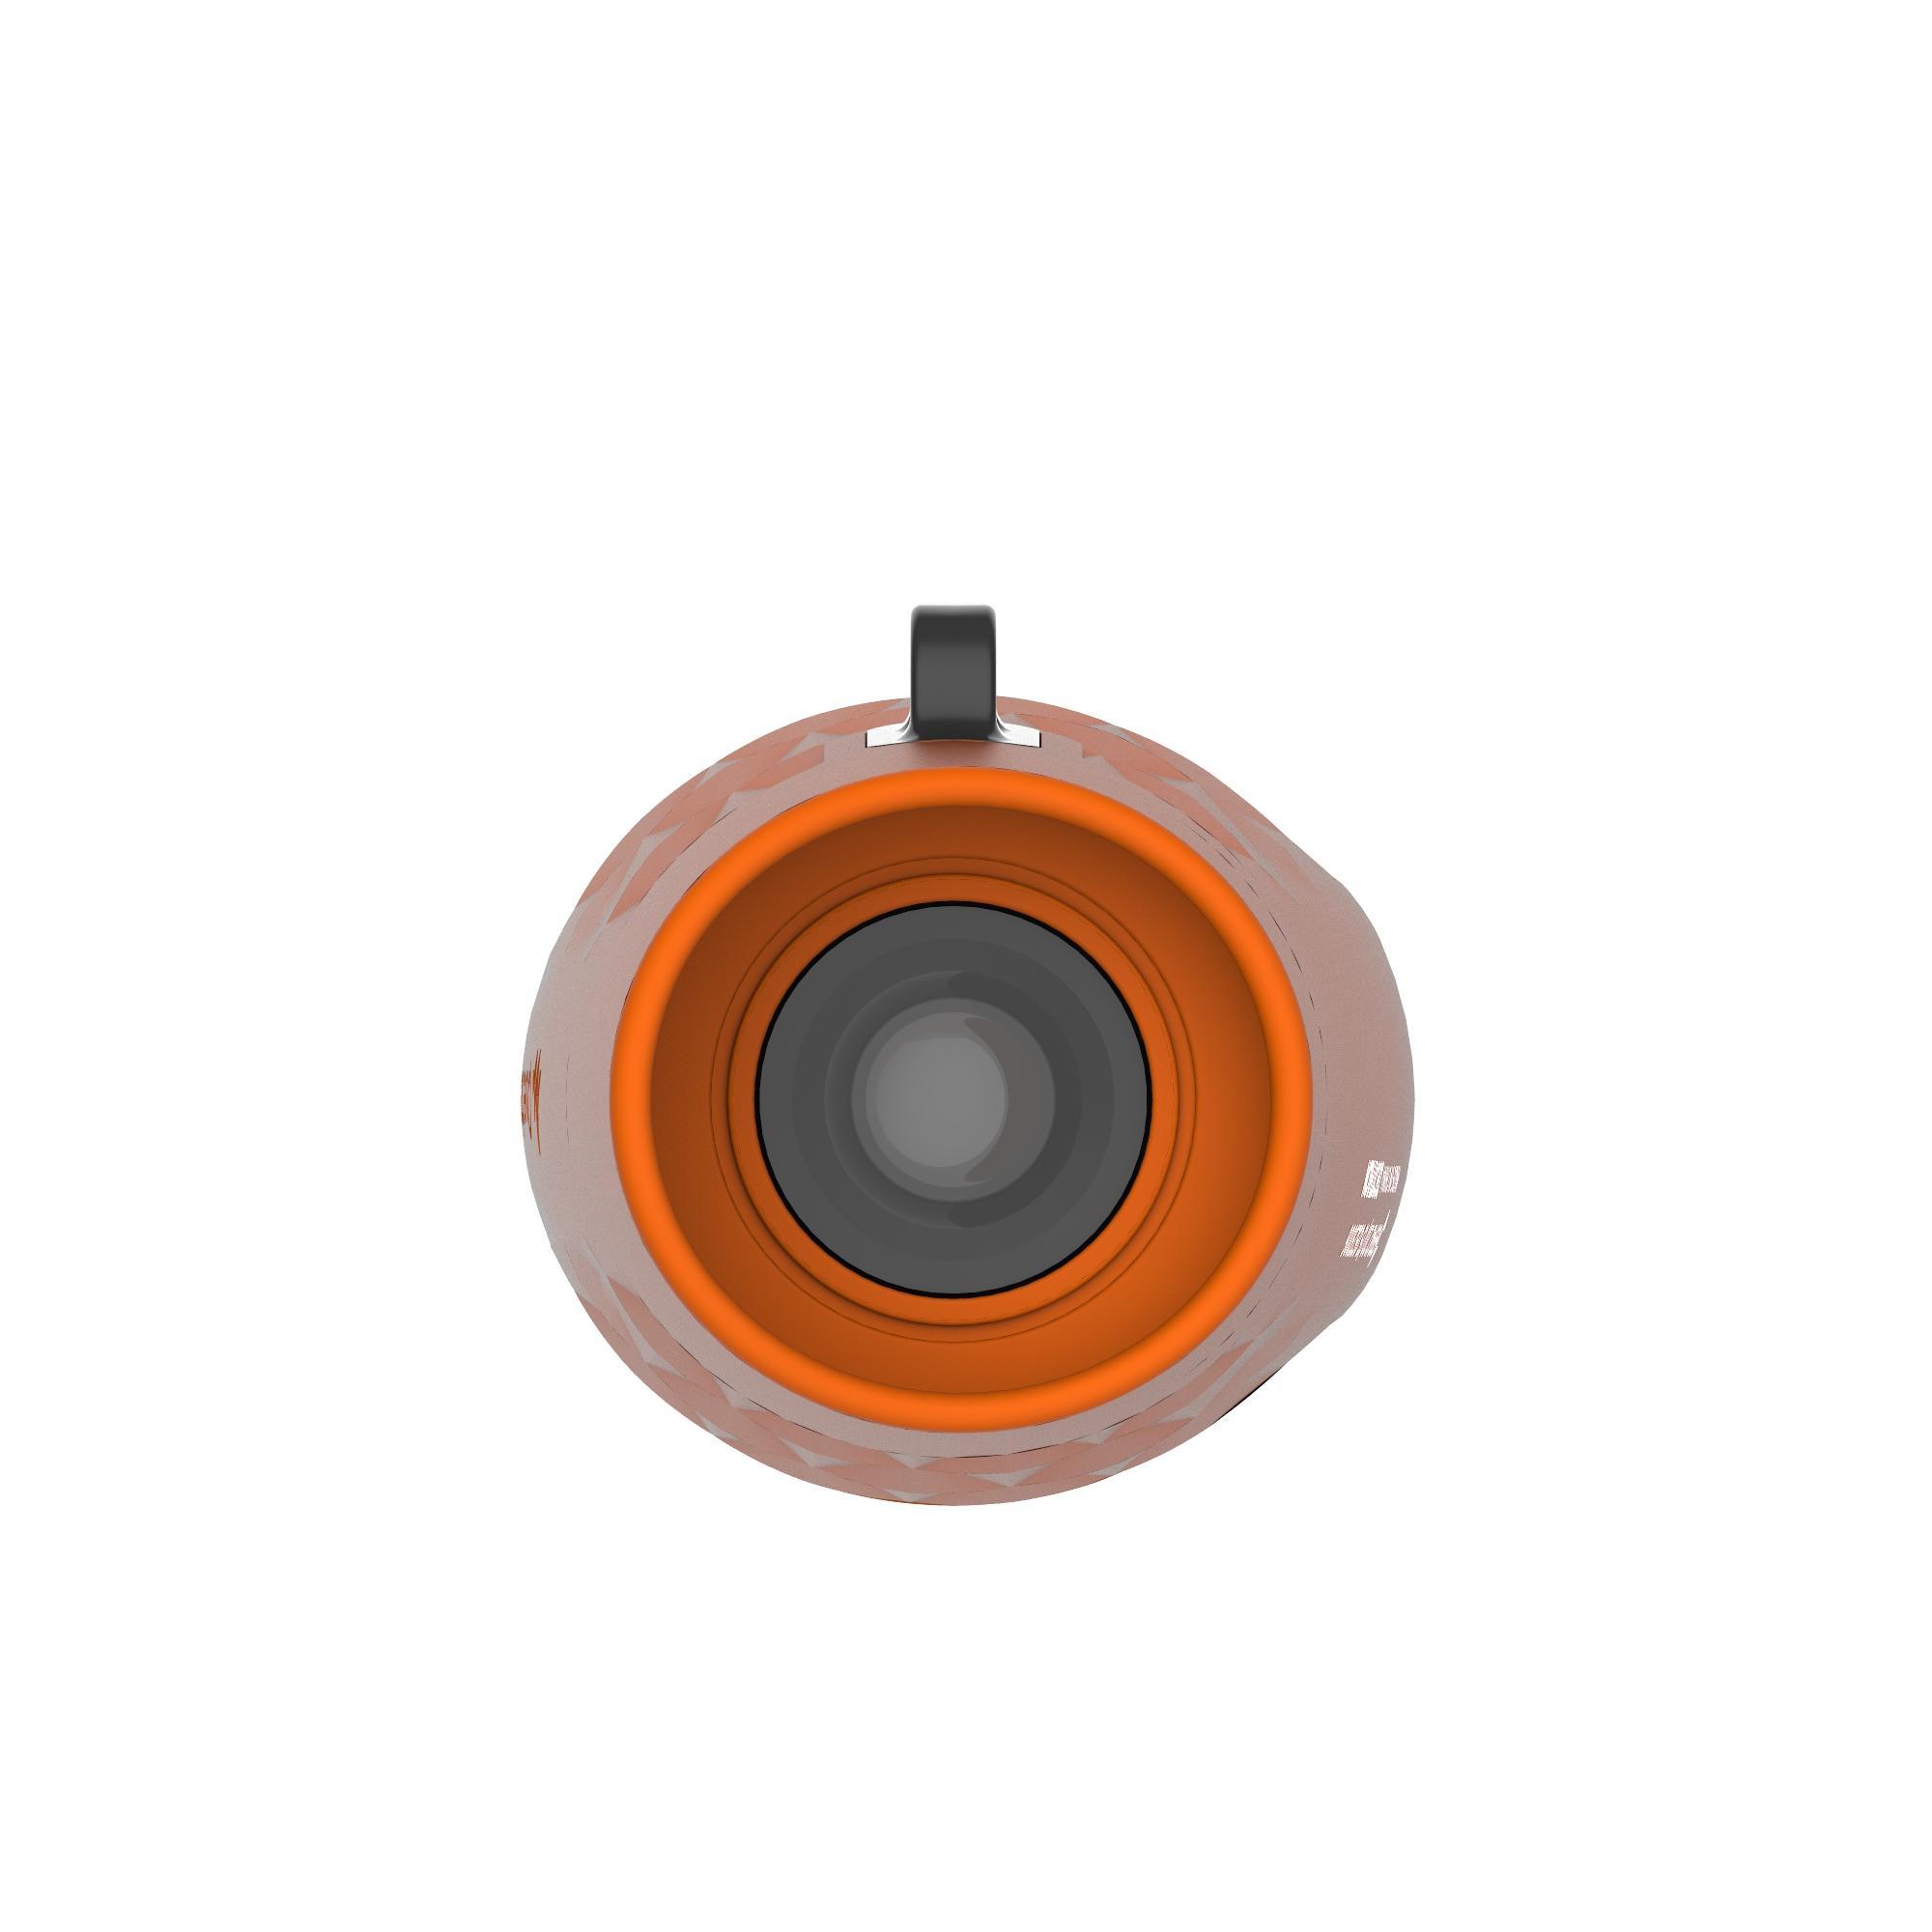 MH M 100 Fixed Focus Children's Hiking x6 Magnification Monocular - Orange